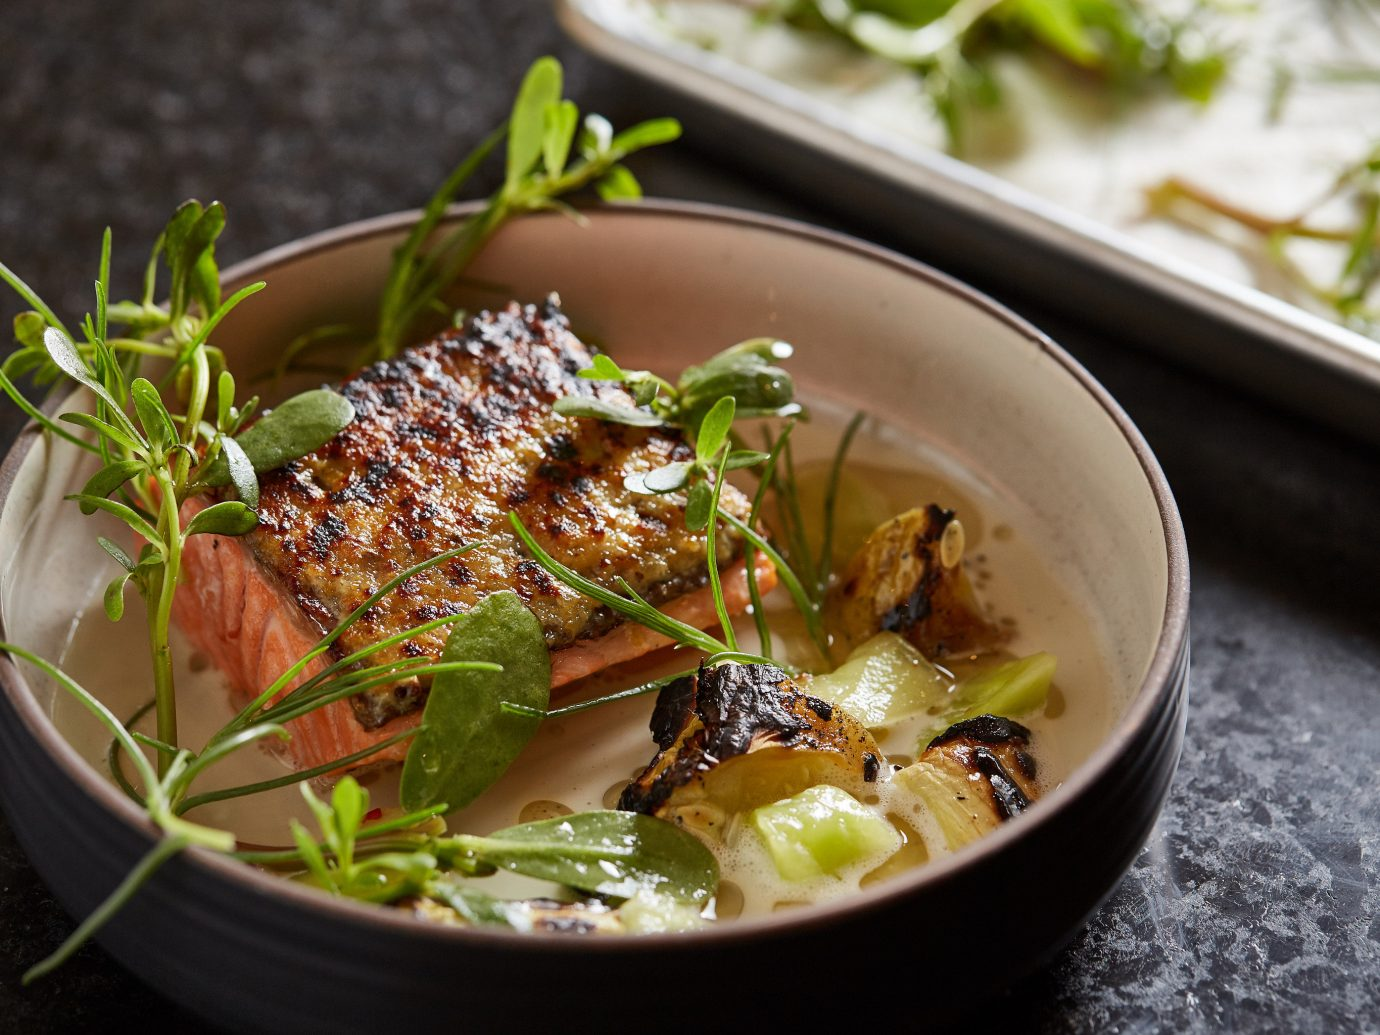 Food + Drink Trip Ideas plant dish food bowl produce cuisine meat vegetable